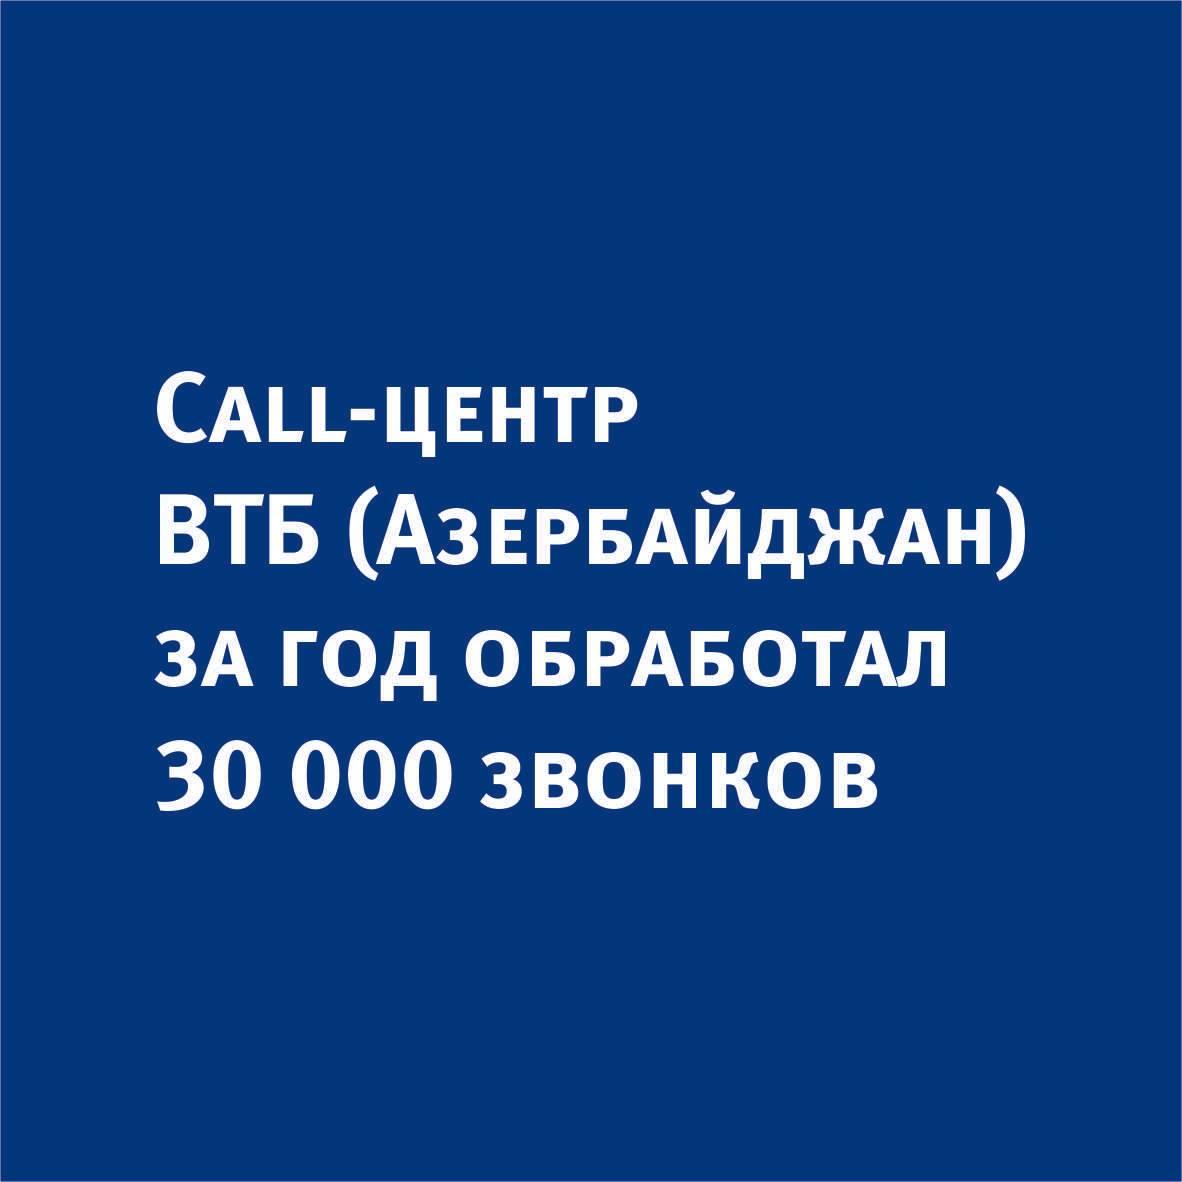 Call-центр ВТБ (Азербайджан) за год обработал 30 тысяч звонков